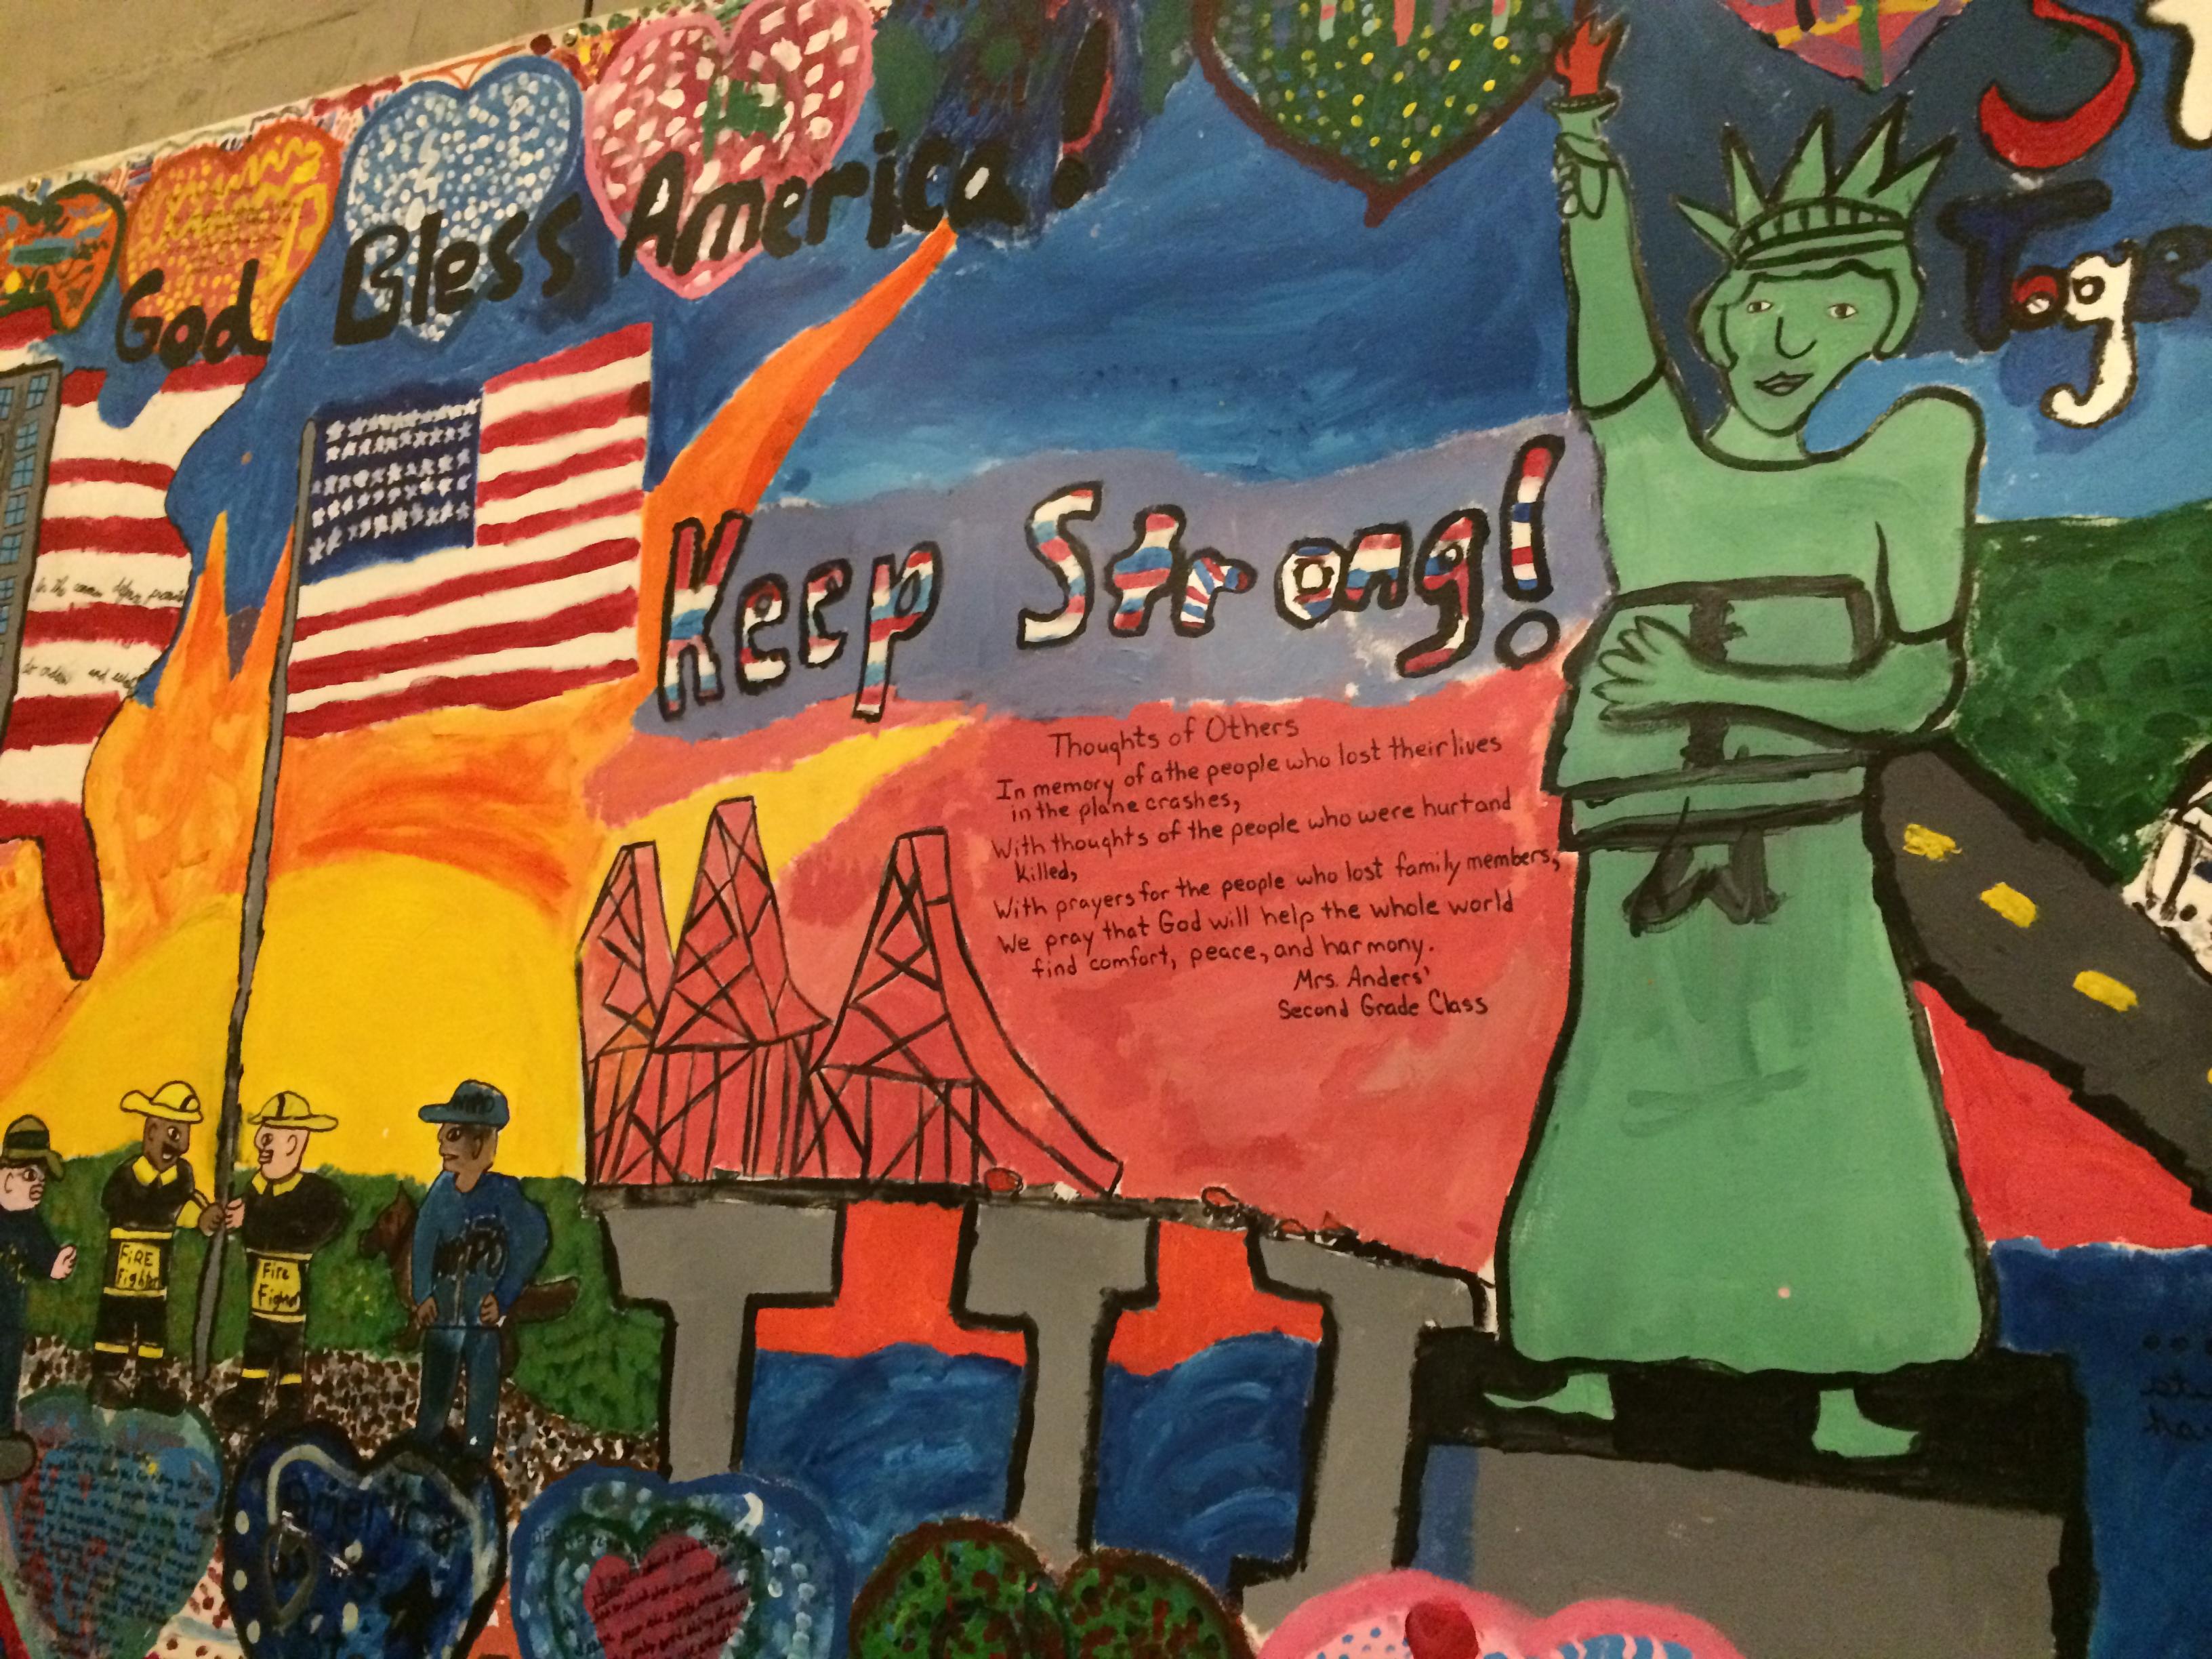 Mural from 9/11 Memorial in NYC